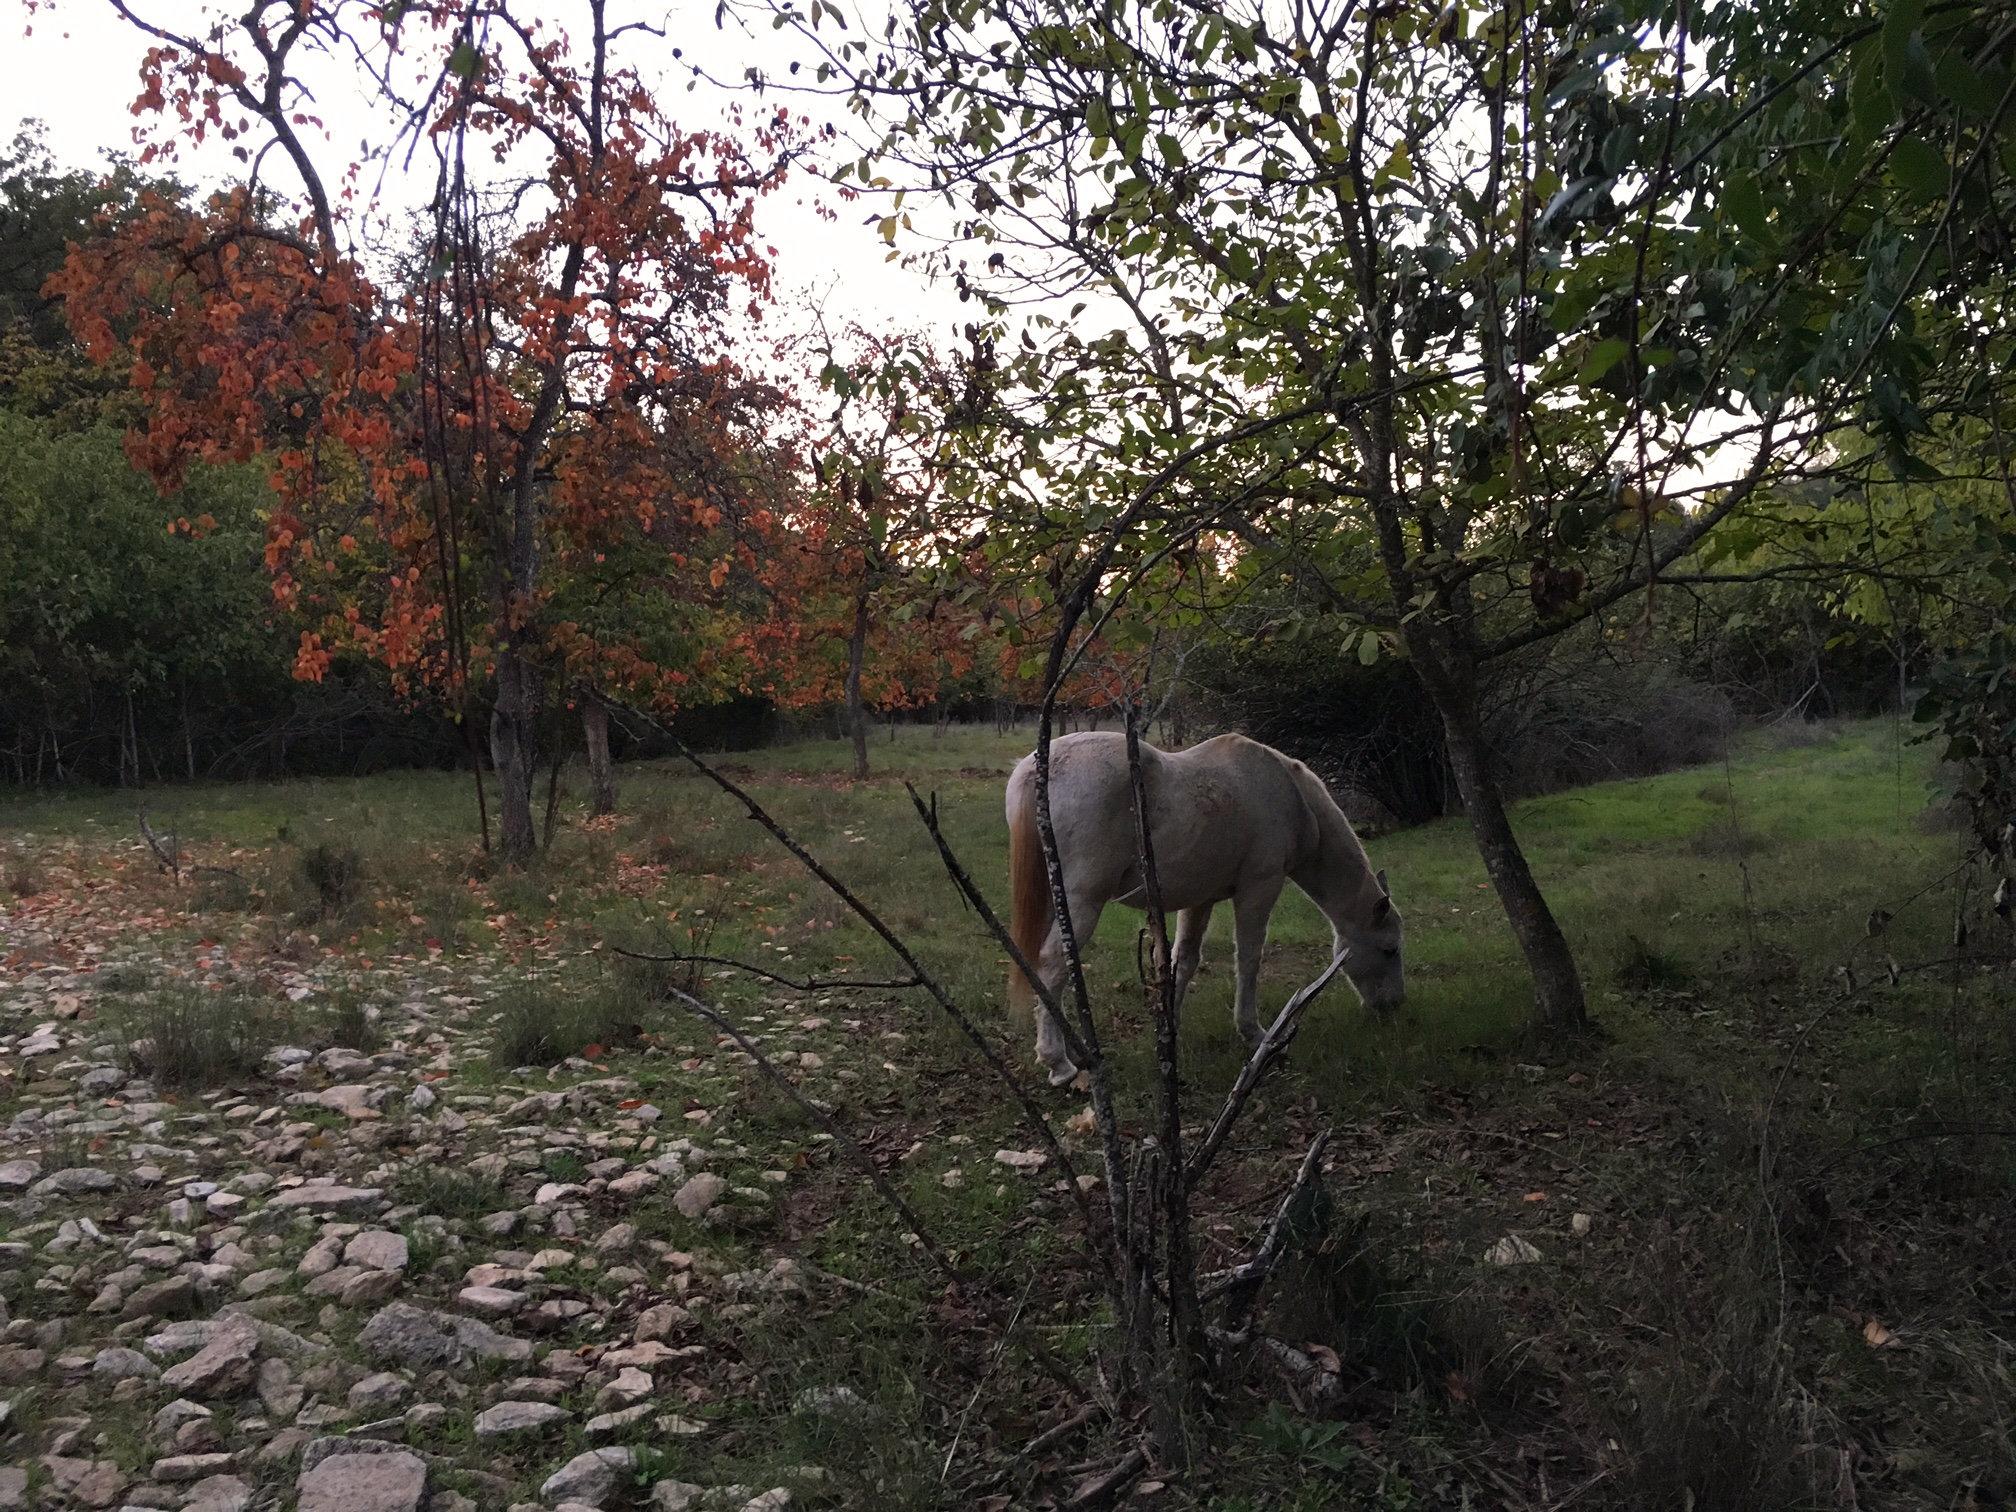 Unicorn_rescued_horse_at_luxury_villa_rental_Ronda_Andalucia_Spain